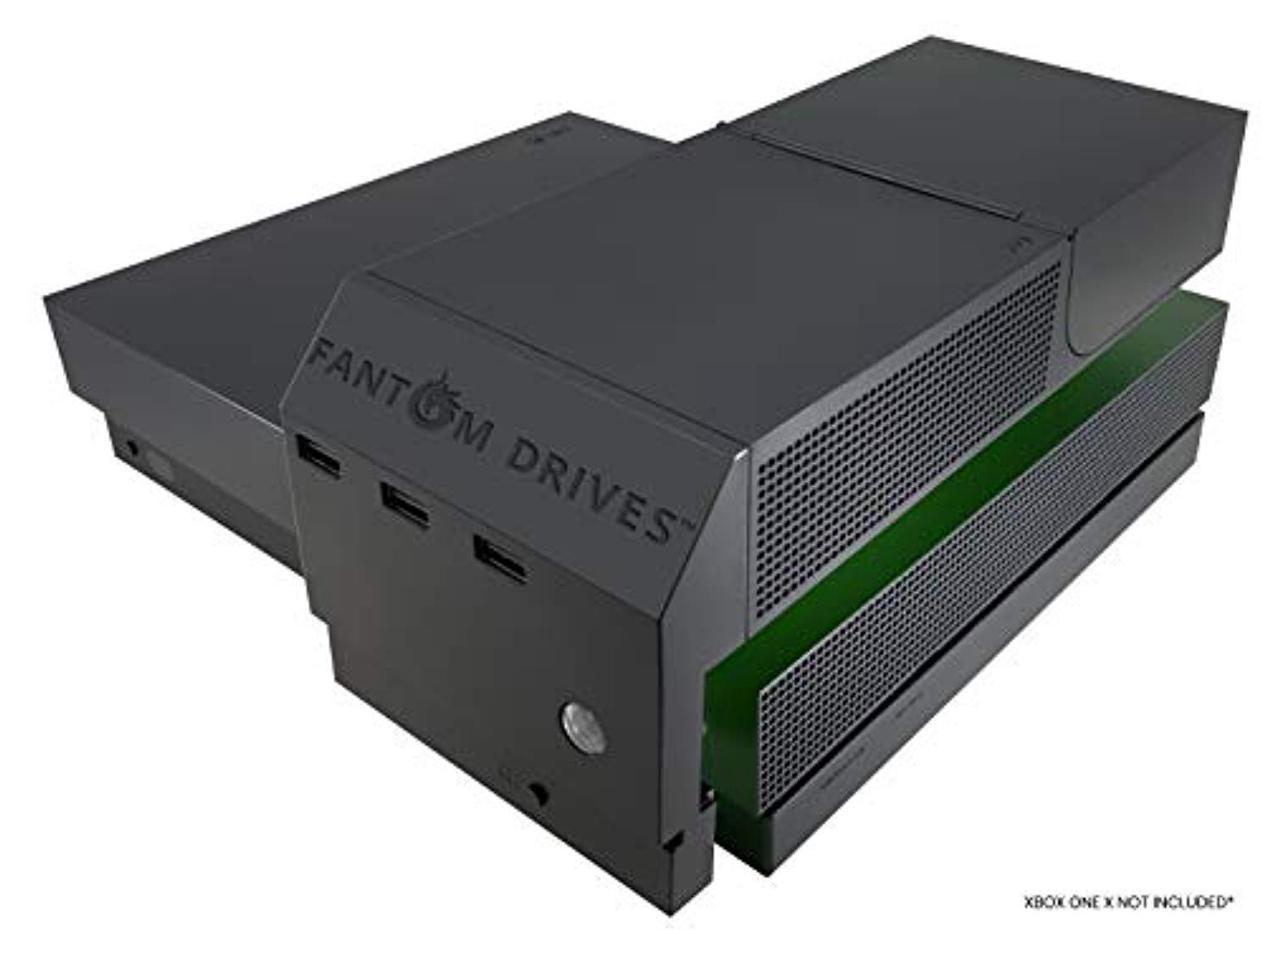 MicroNet XSTOR 8 TB Hard Drive - External - Plug-in Module ...